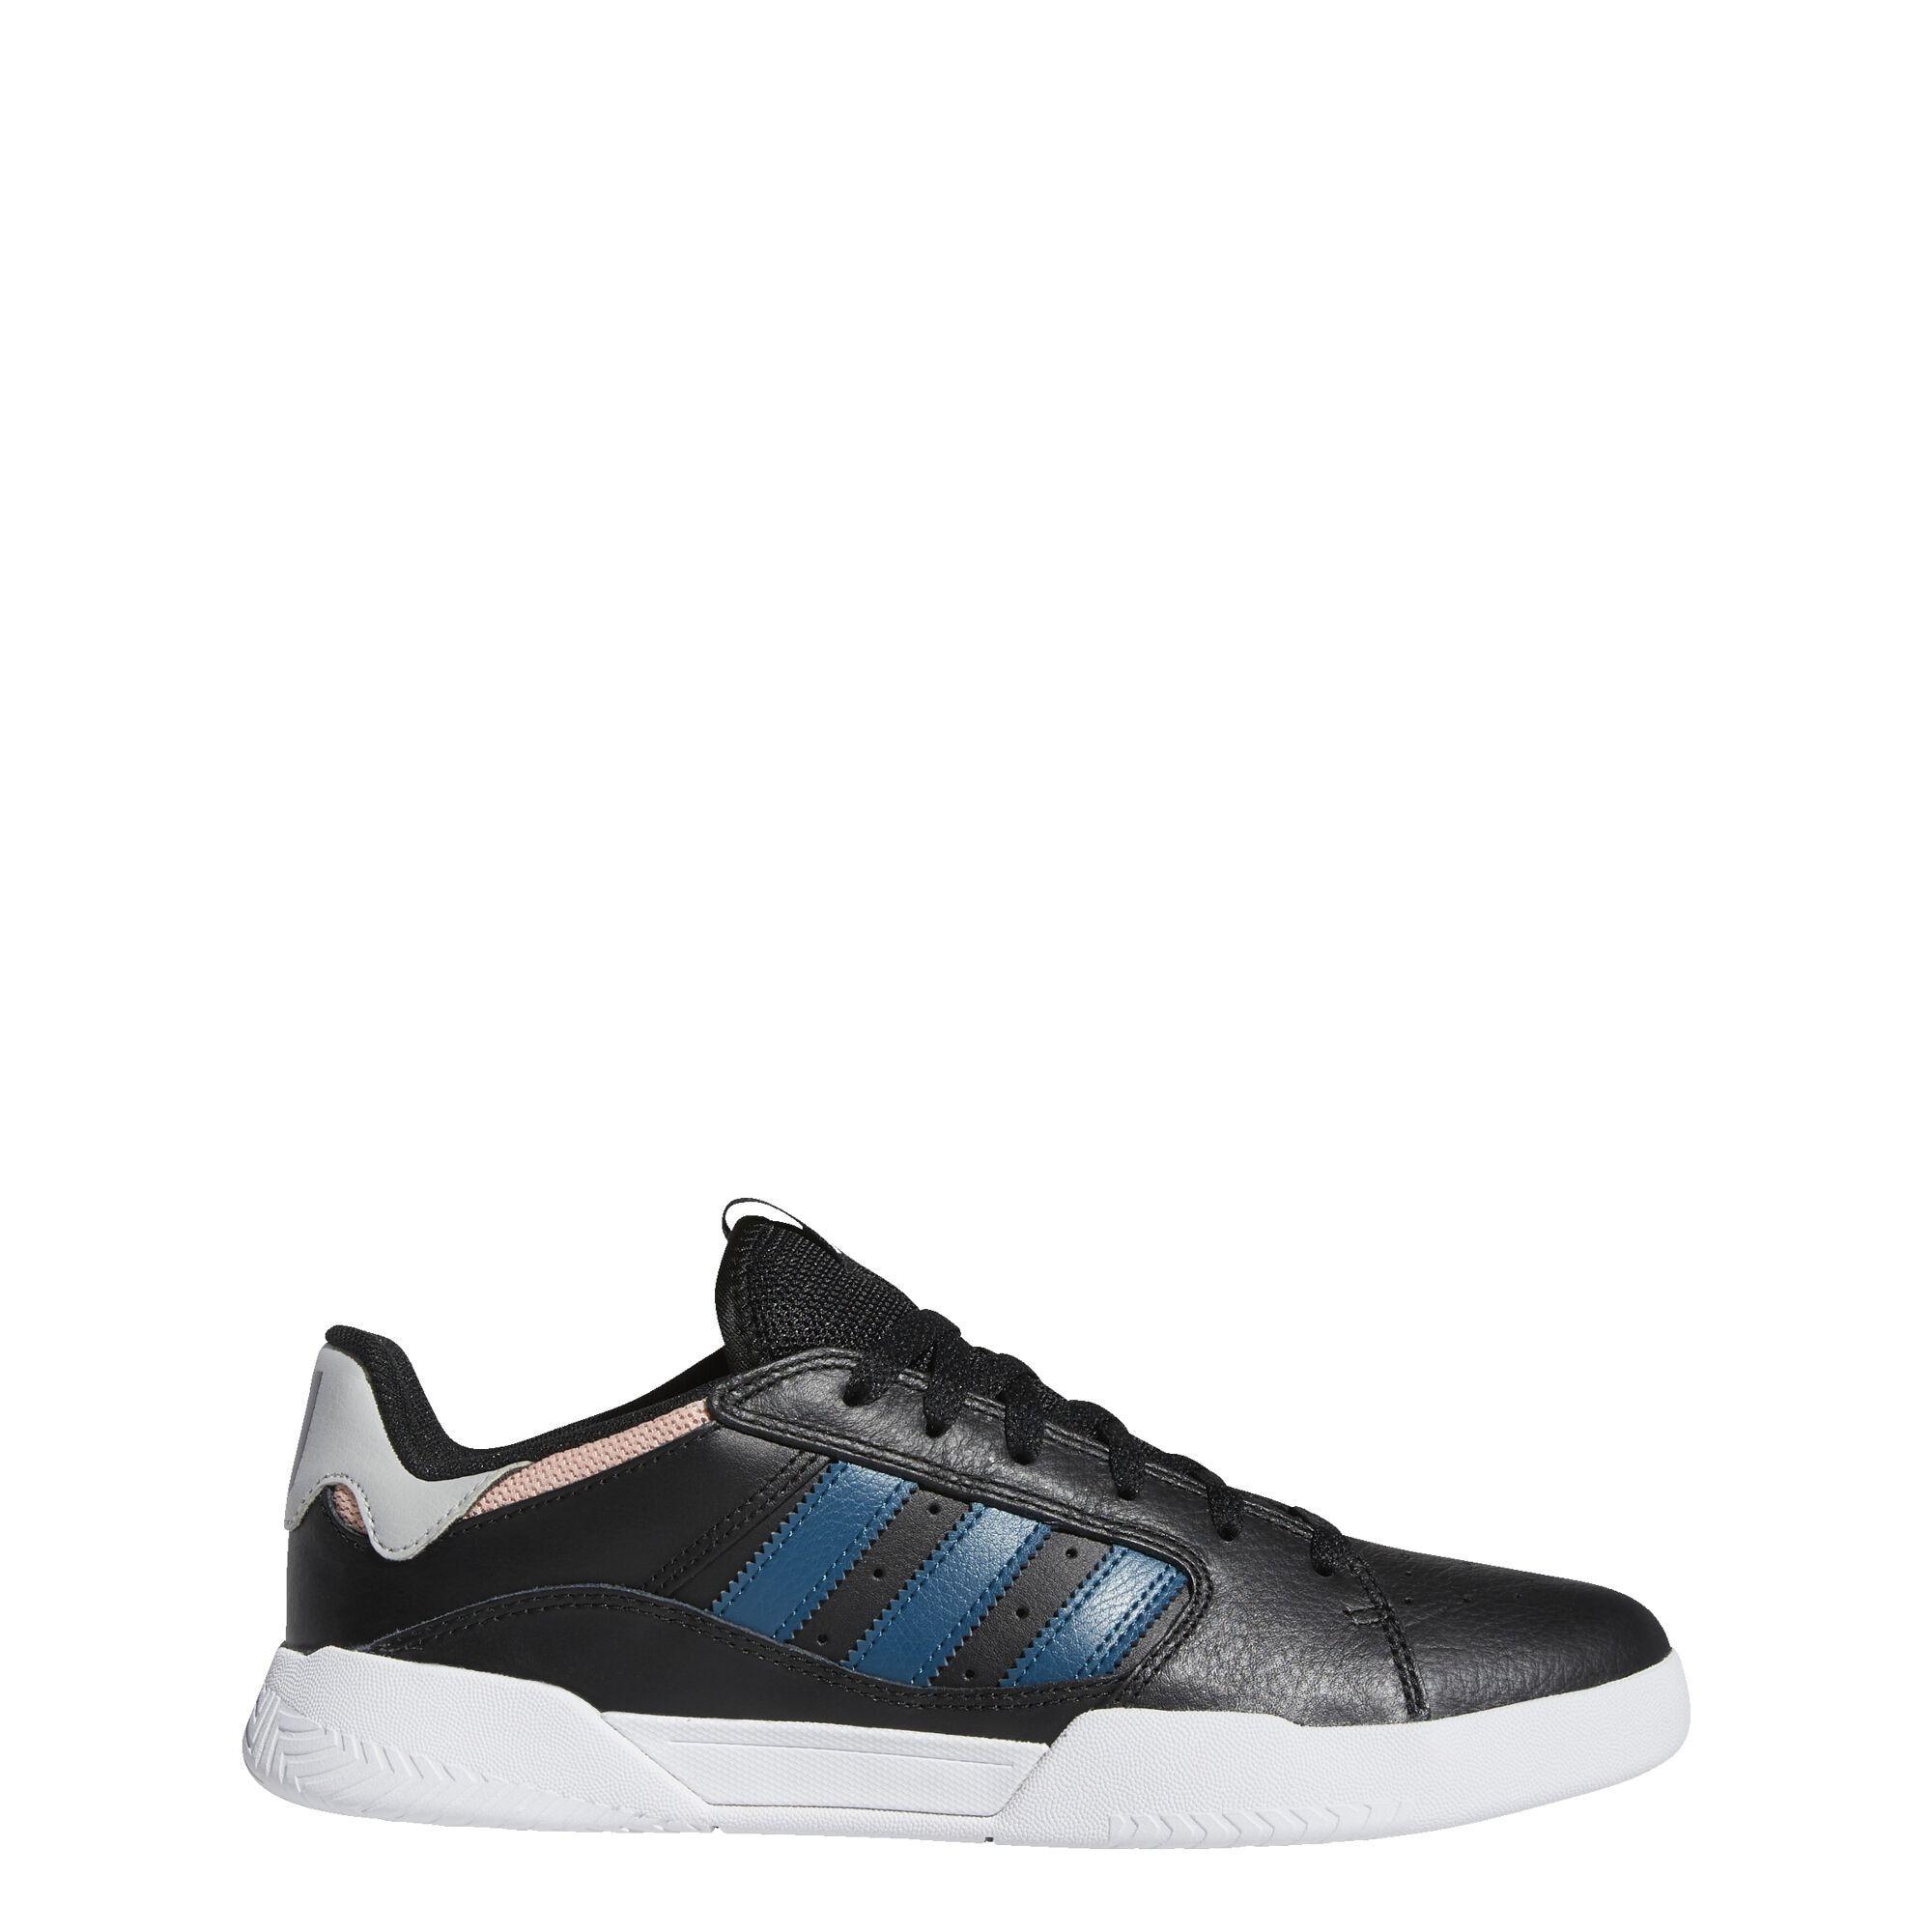 Adidas Originals Schuhe Vrx Herren Schwarz Grosse 49 49 5 Adidas Originals Schuhe Adidas Originals Und Adidas